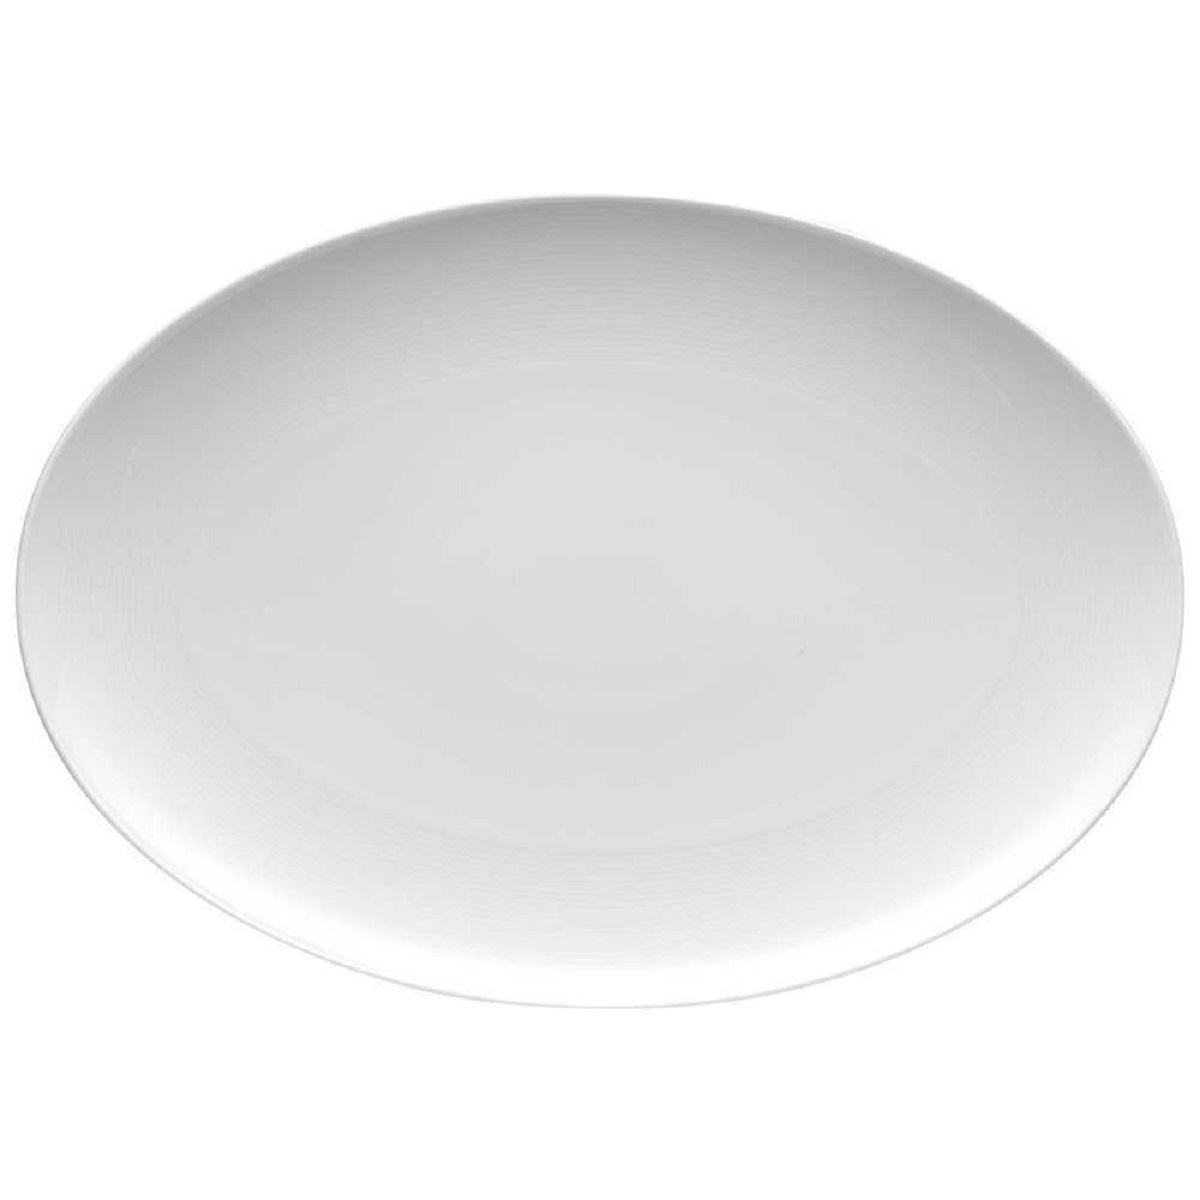 Онлайн каталог PROMENU: Блюдо фарфоровое Rosenthal Loft, длина 40 см, белый Rosenthal 11900-800001-12740